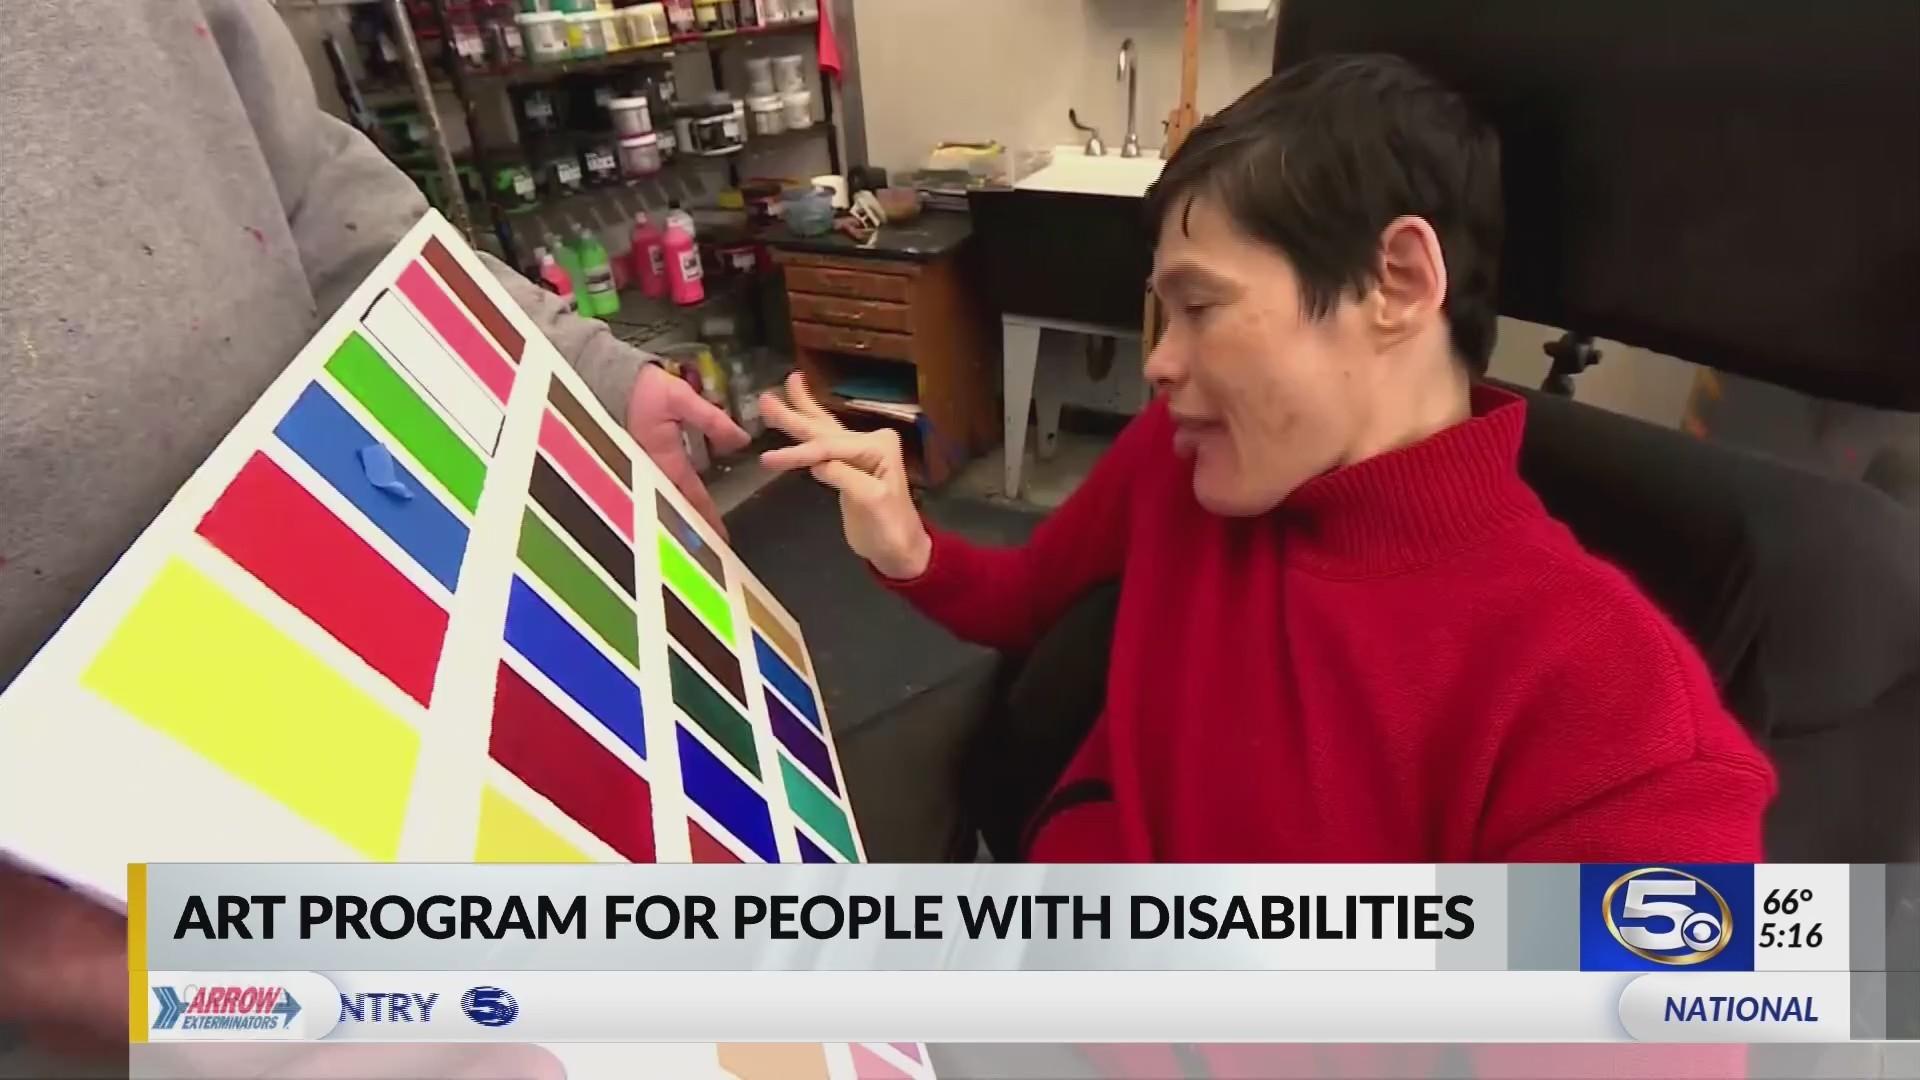 VIDEO: Arts program unlocks potential of severely disabled artists